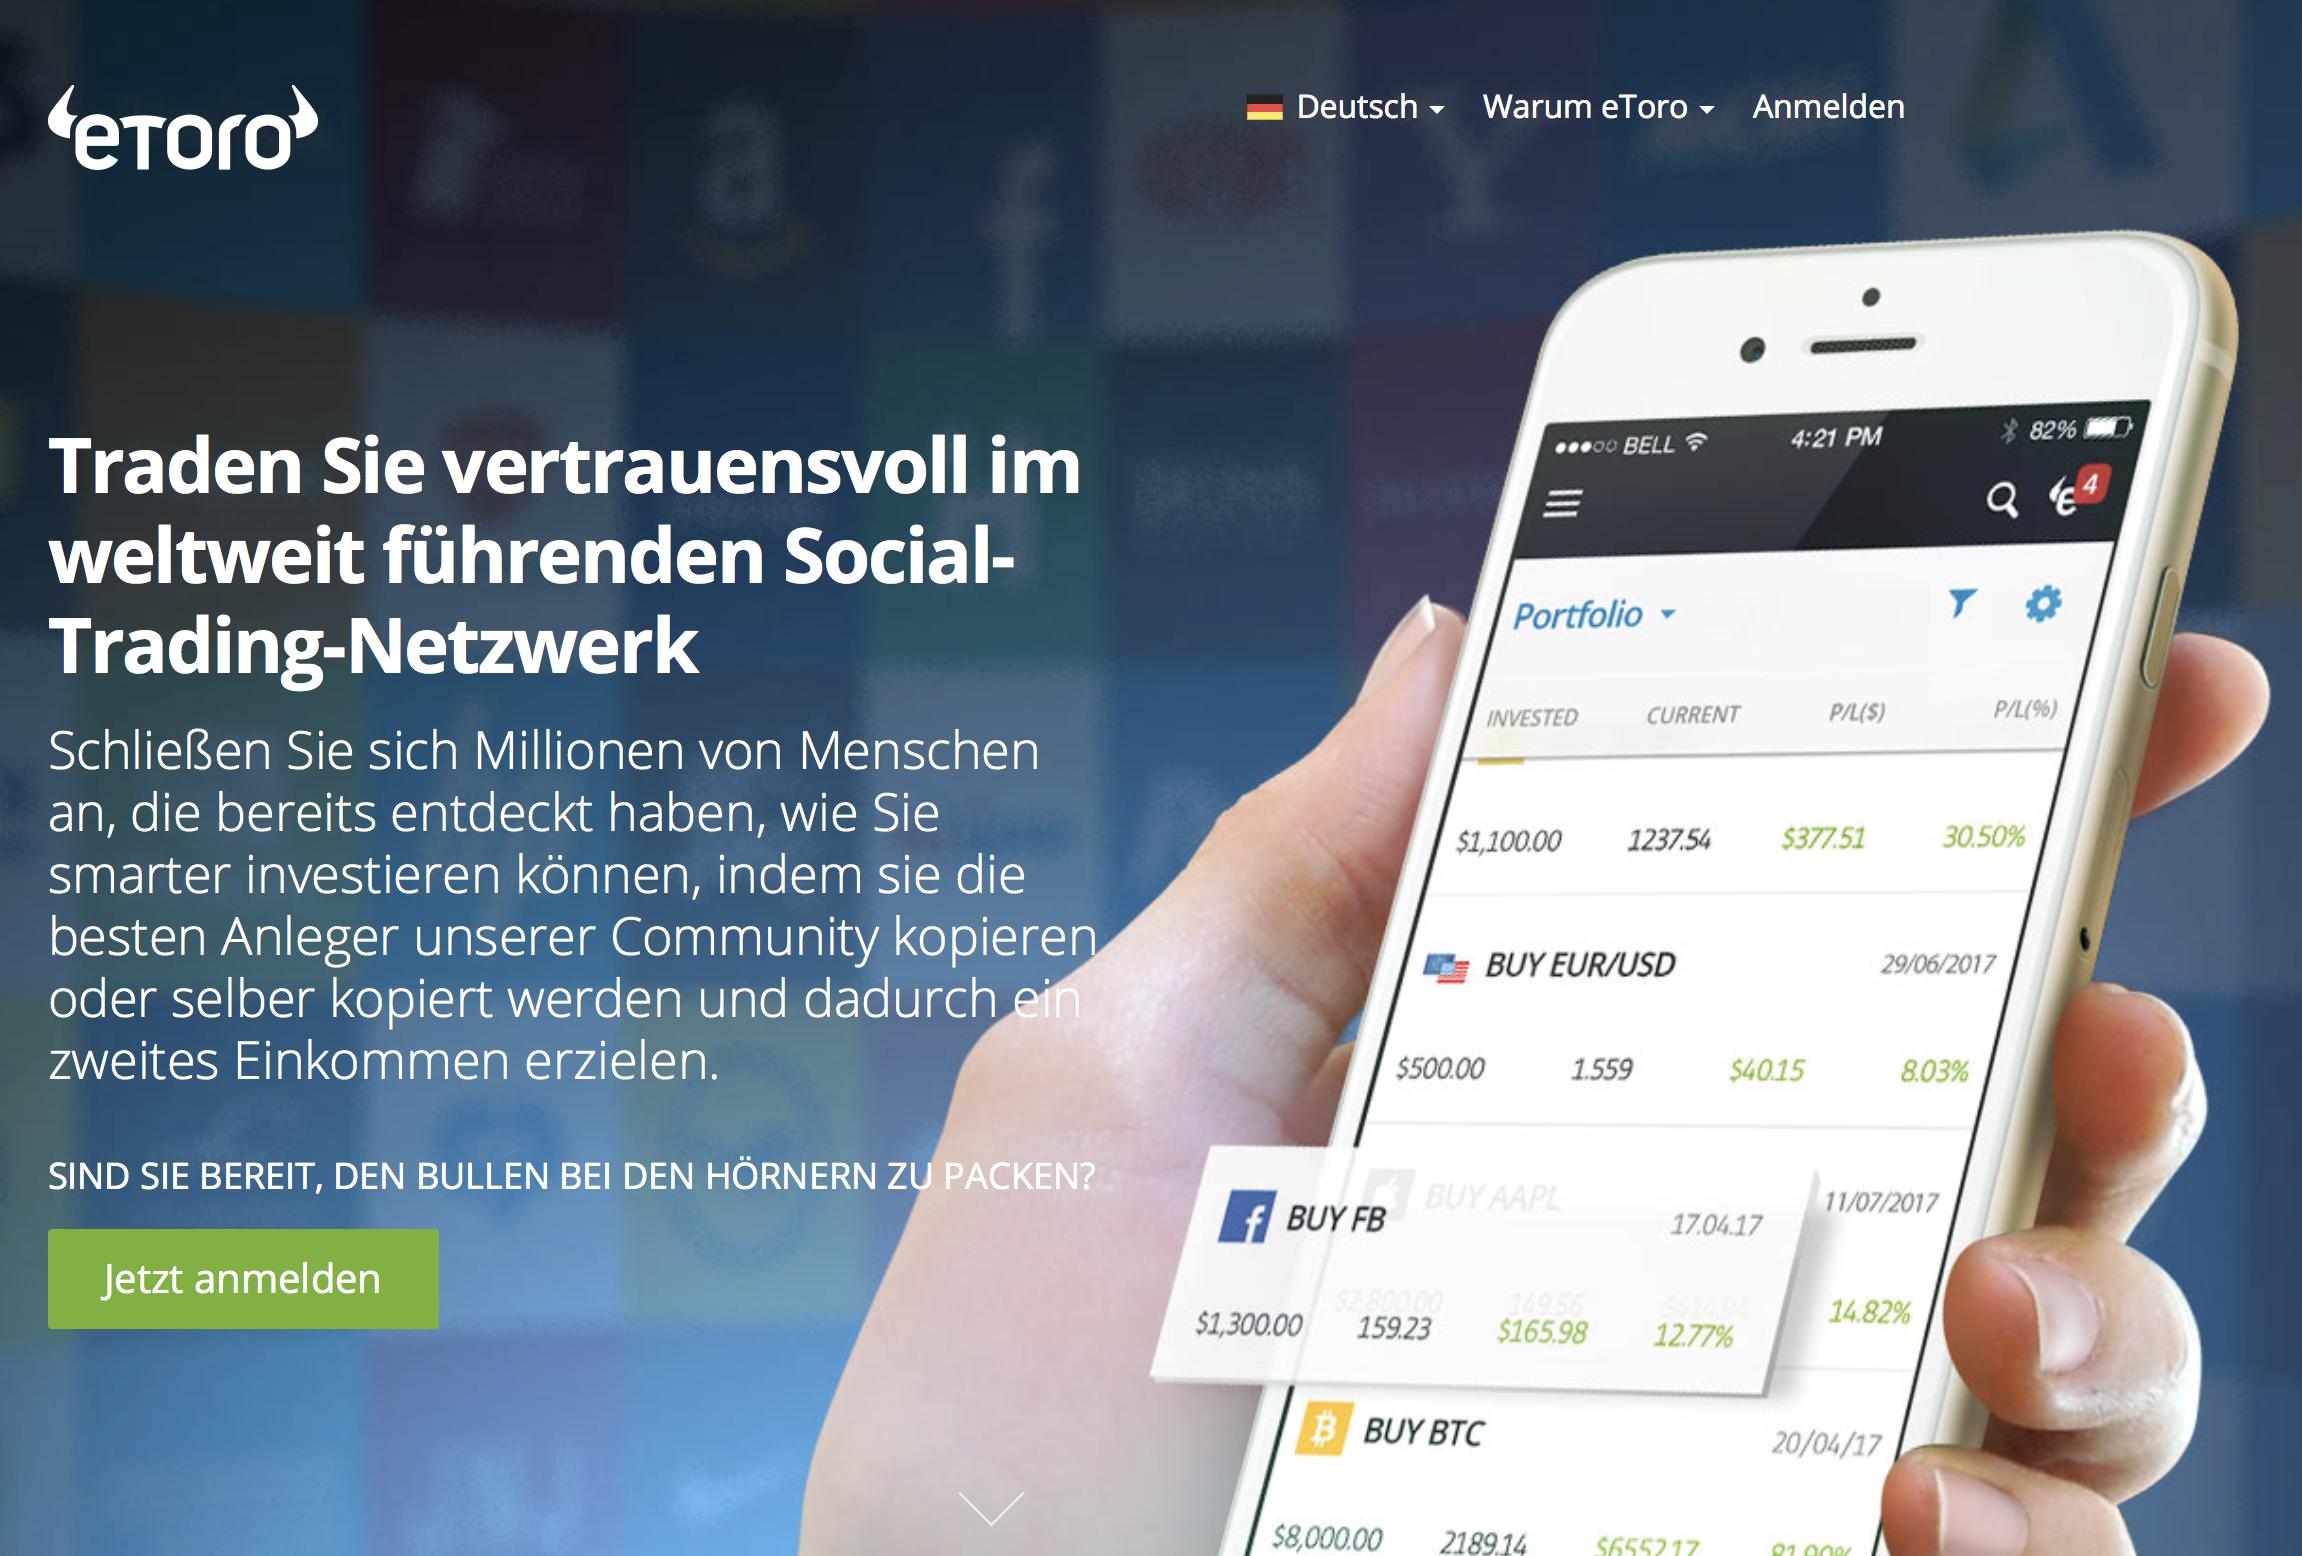 Weltweit führend im Social-Trading - eToro